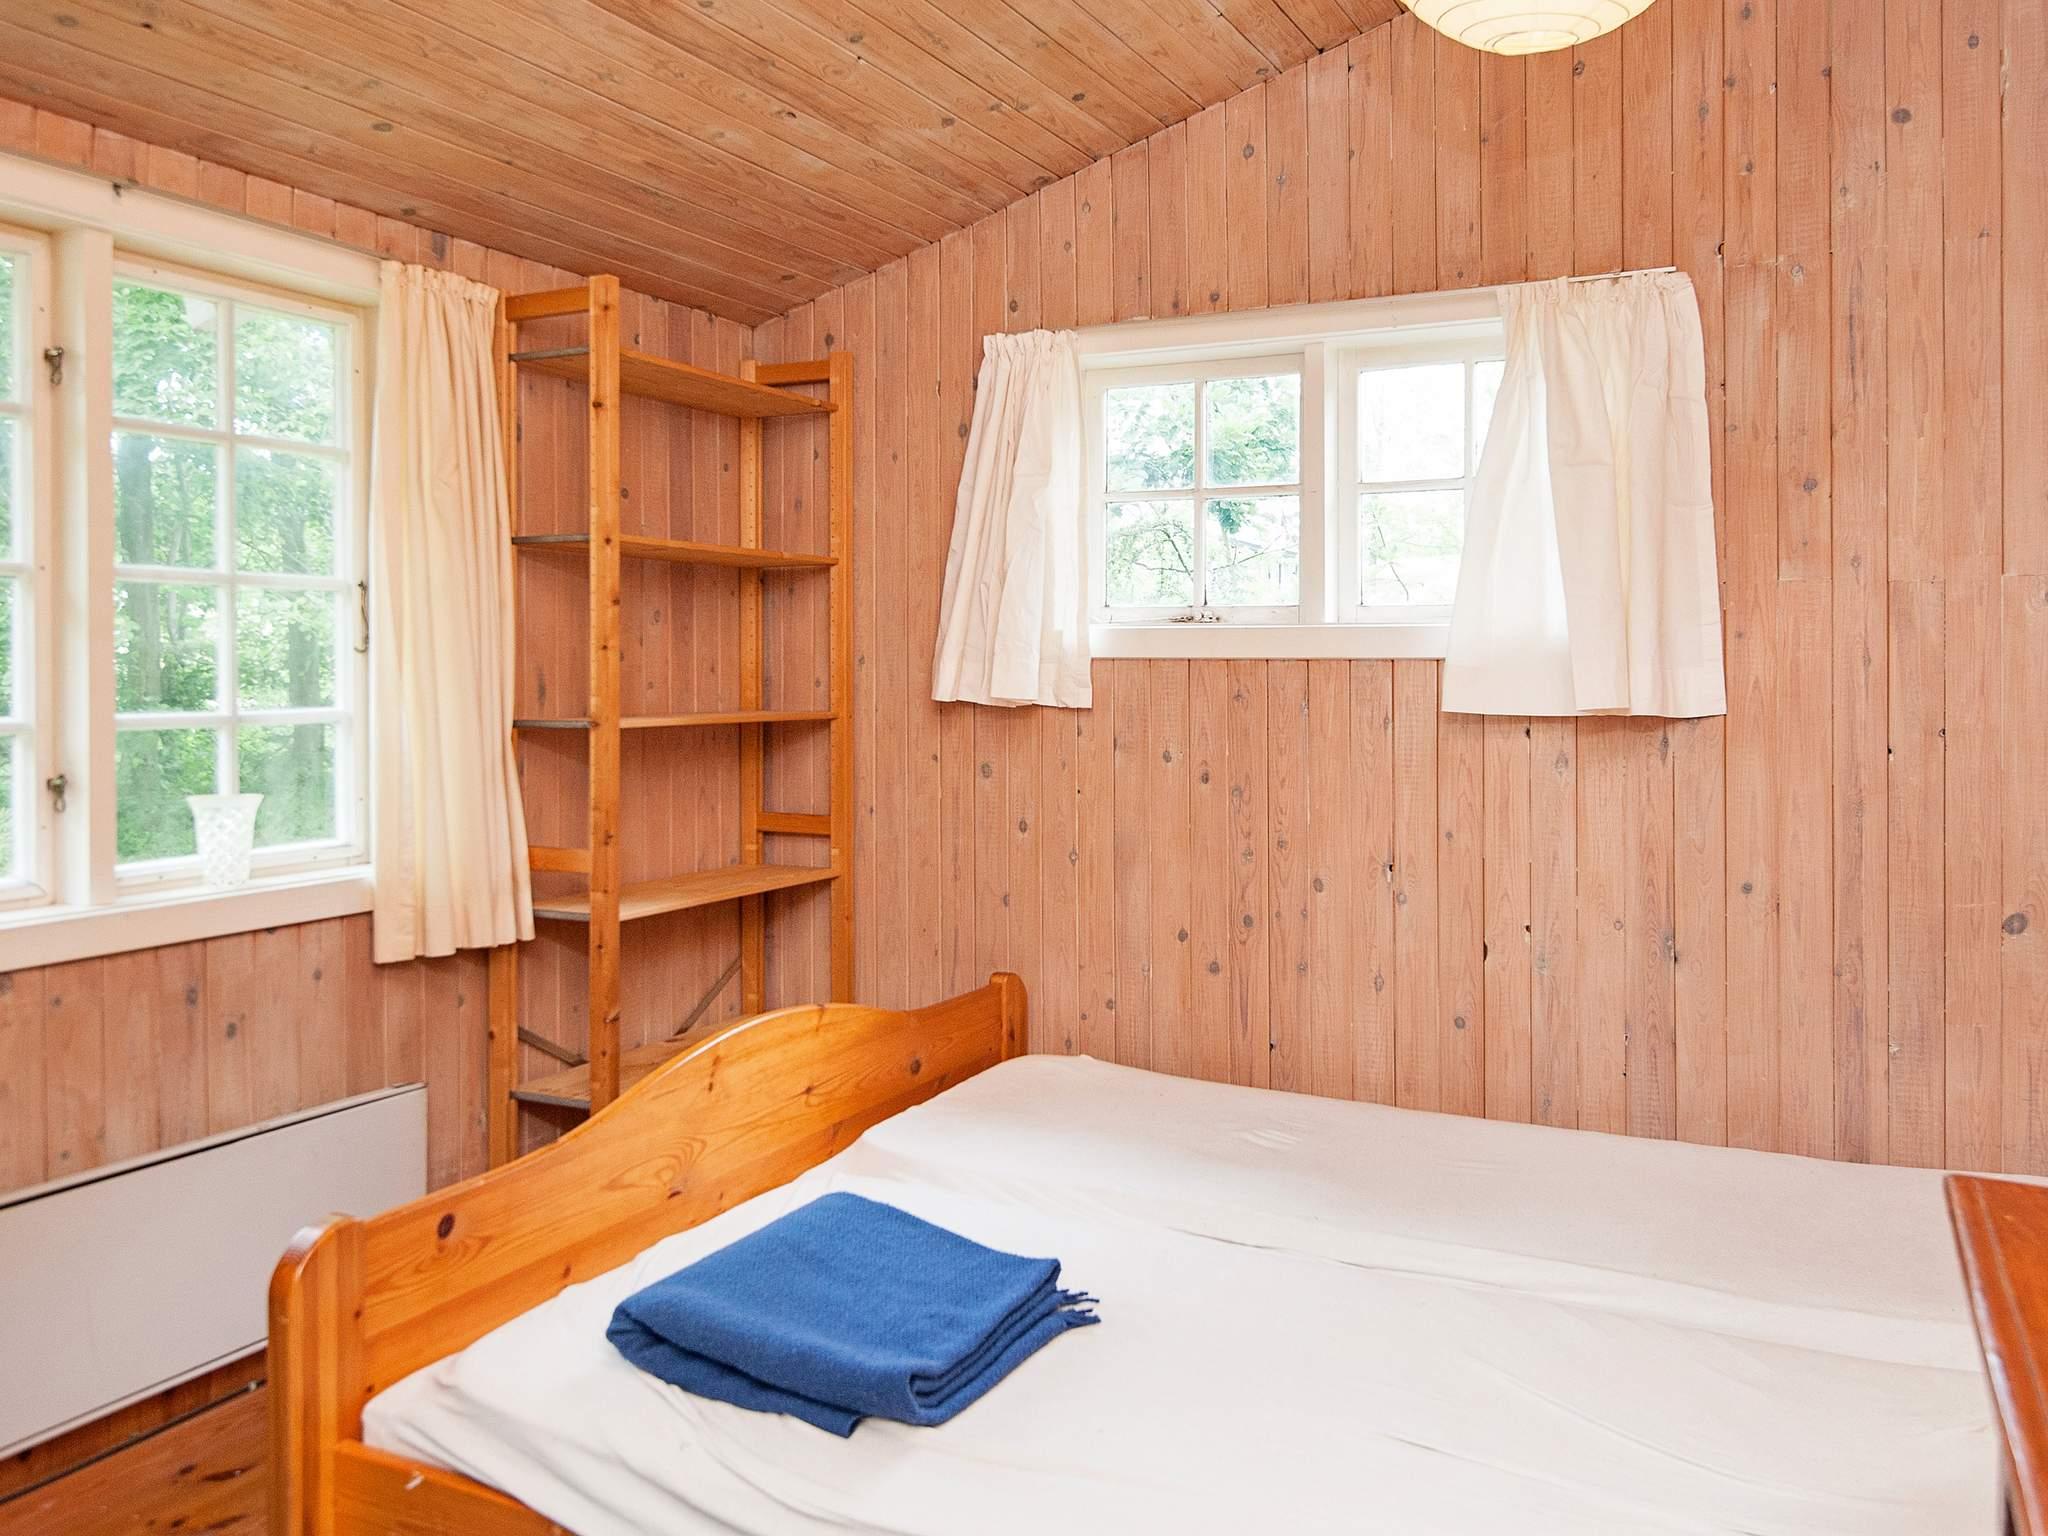 Maison de vacances Helgenæs (2354348), Knebel, , Mer Baltique danoise, Danemark, image 8